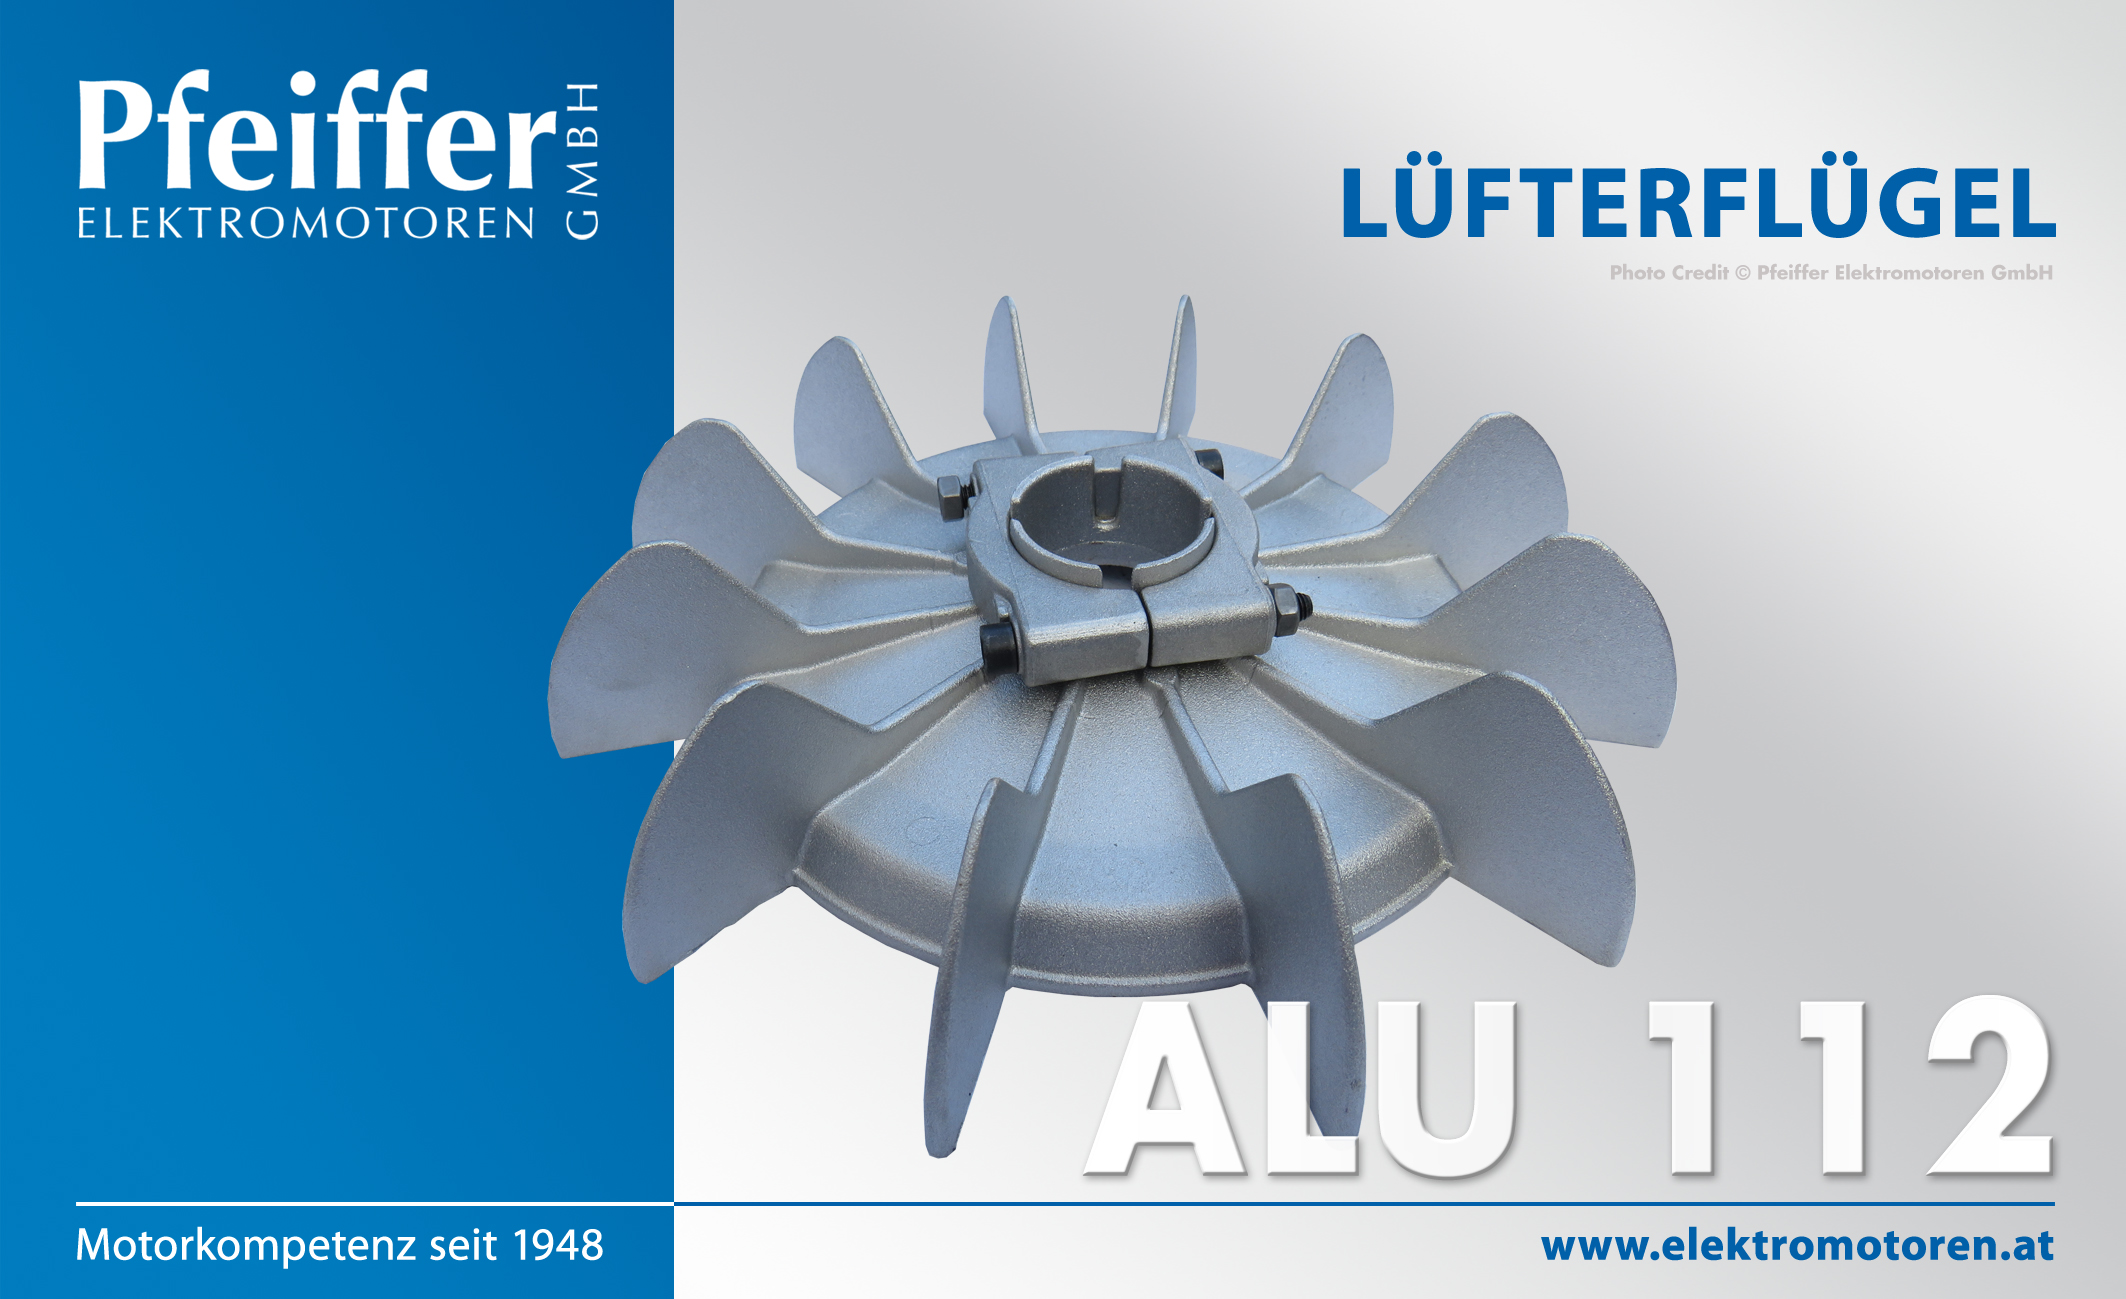 Lüfterflügel Lüfterrad Lüfter für Elektromotor Drehstrommotor Baugröße 132